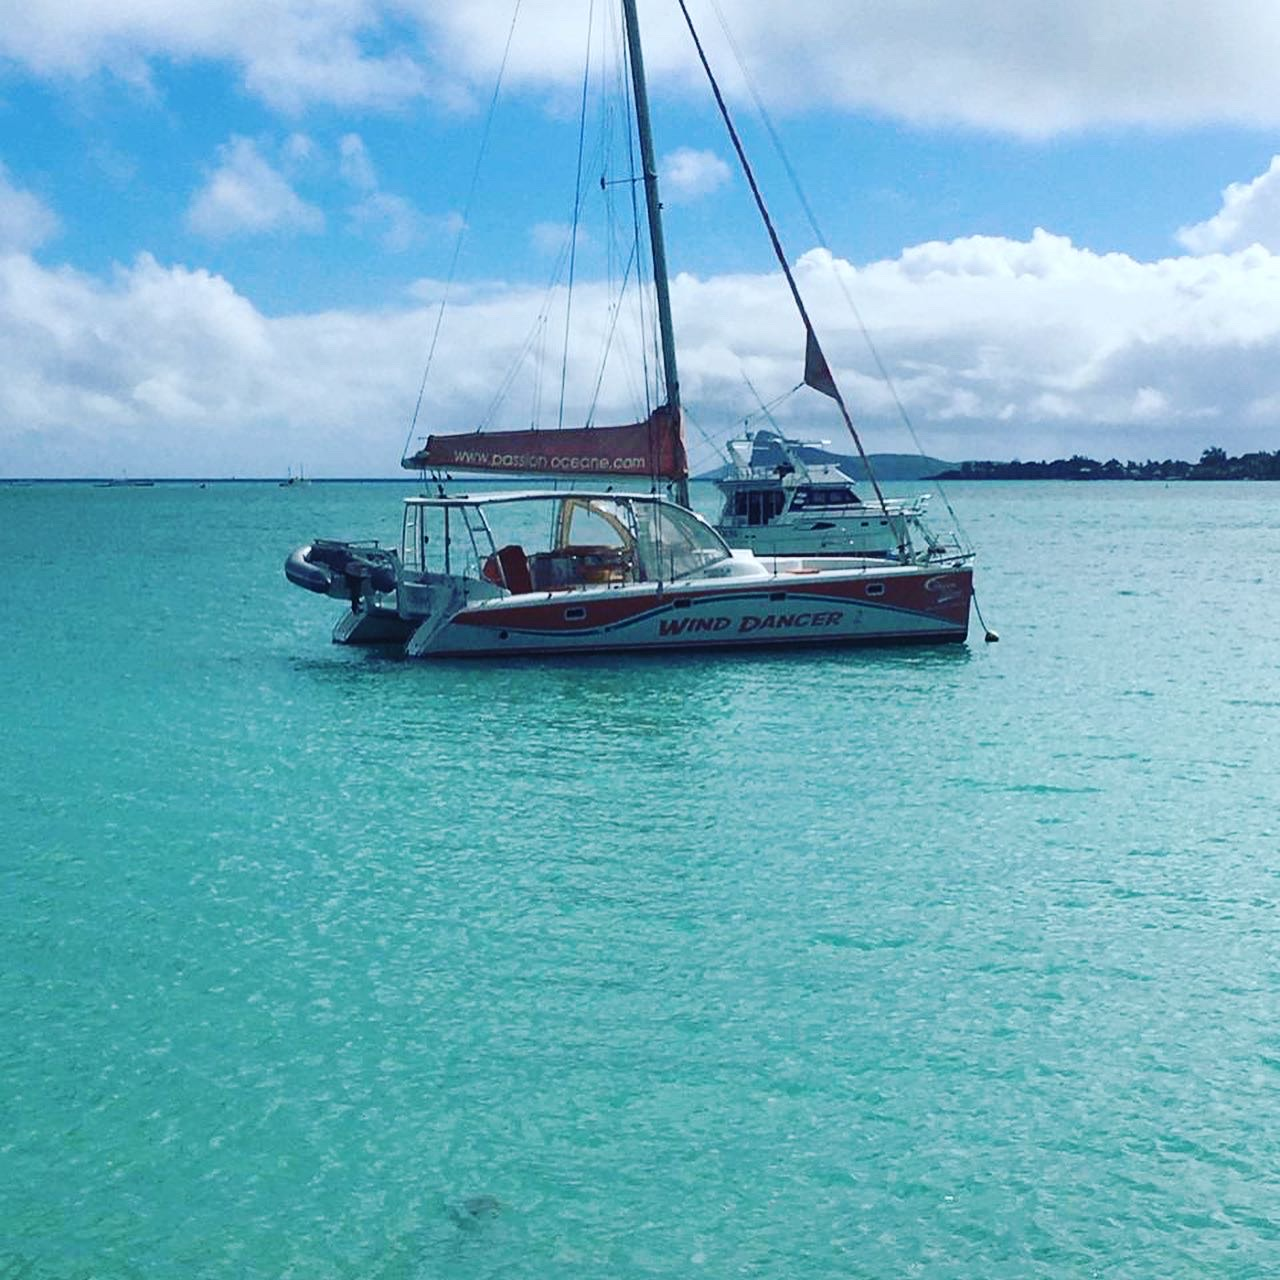 Full Day Northern Isles Cruise Sharing